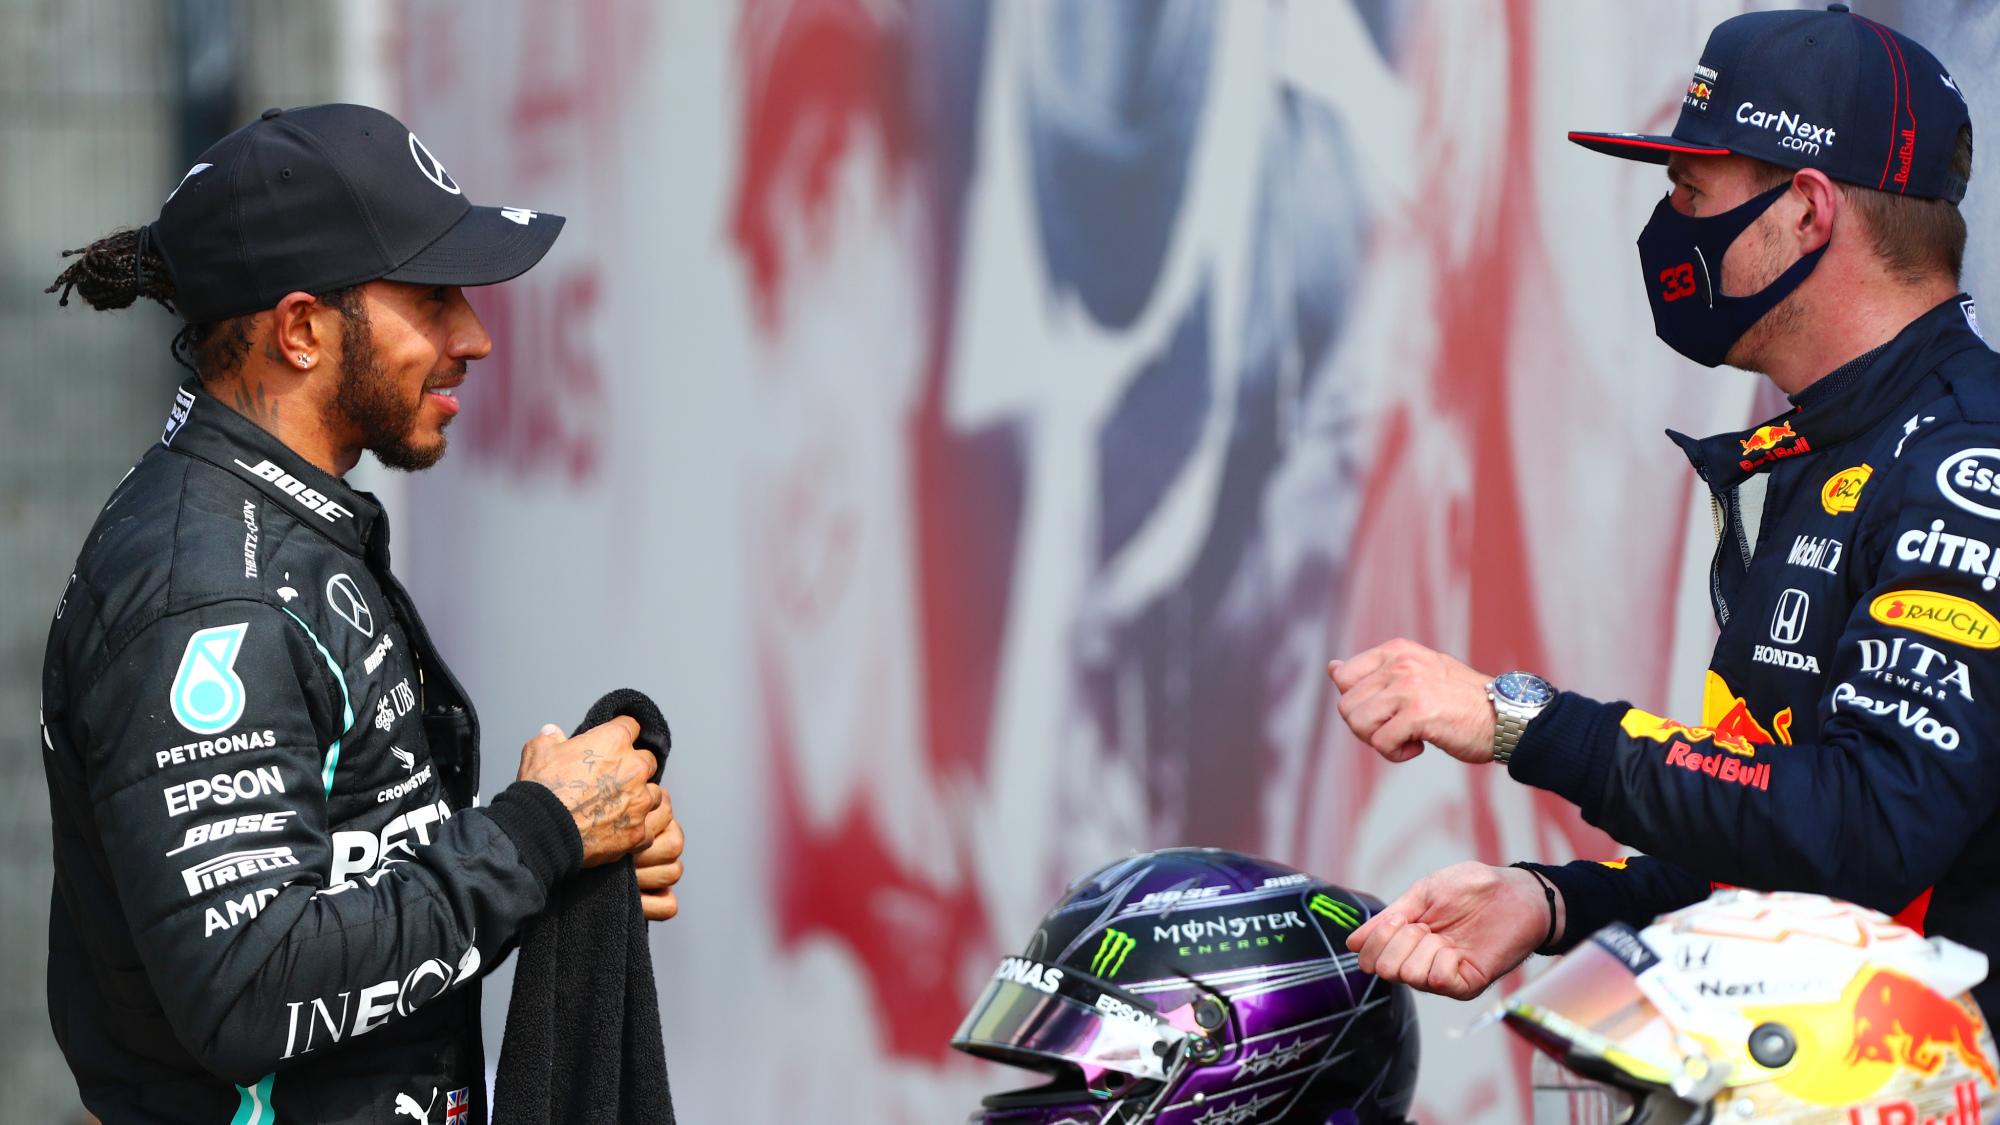 Lewis Hamilton, Max Verstappen, Silverstone II 2020